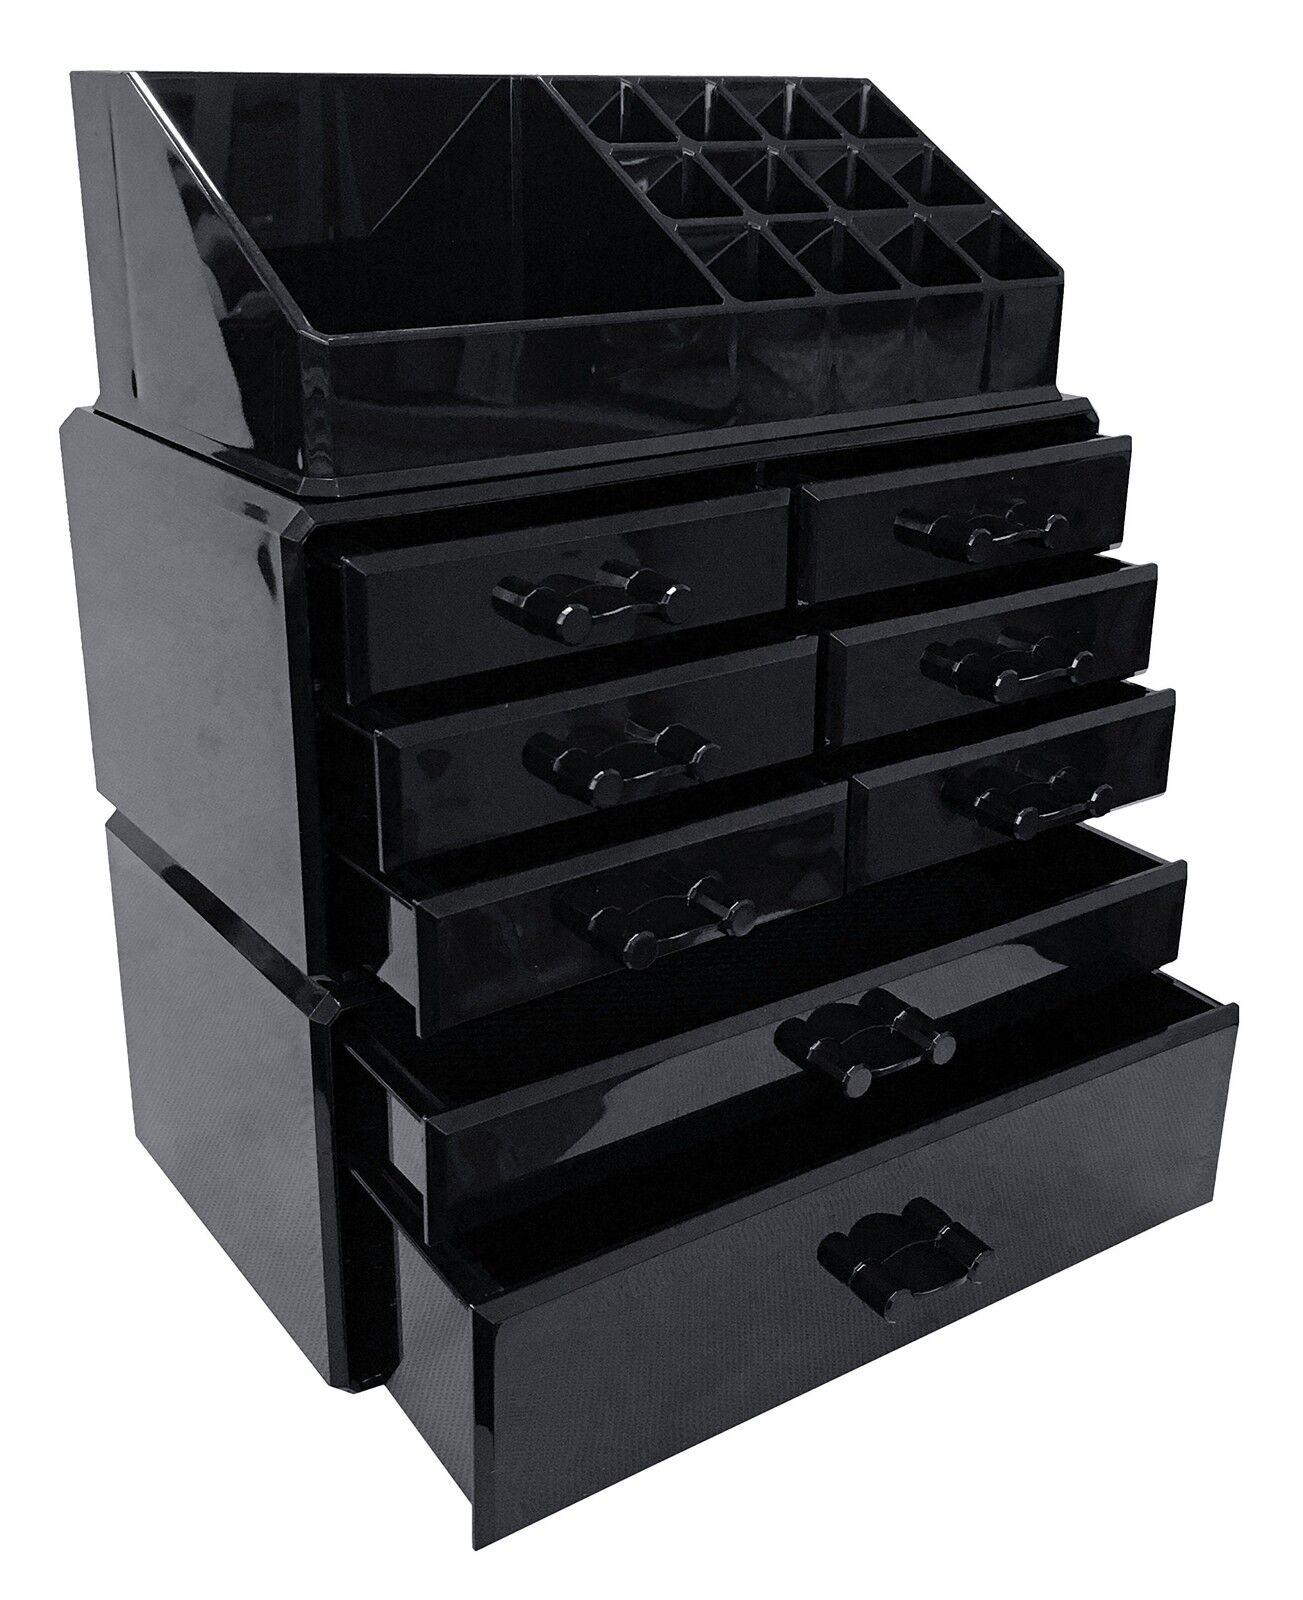 Black Acrylic Makeup Organizer Drawers Box Cosmetic Display